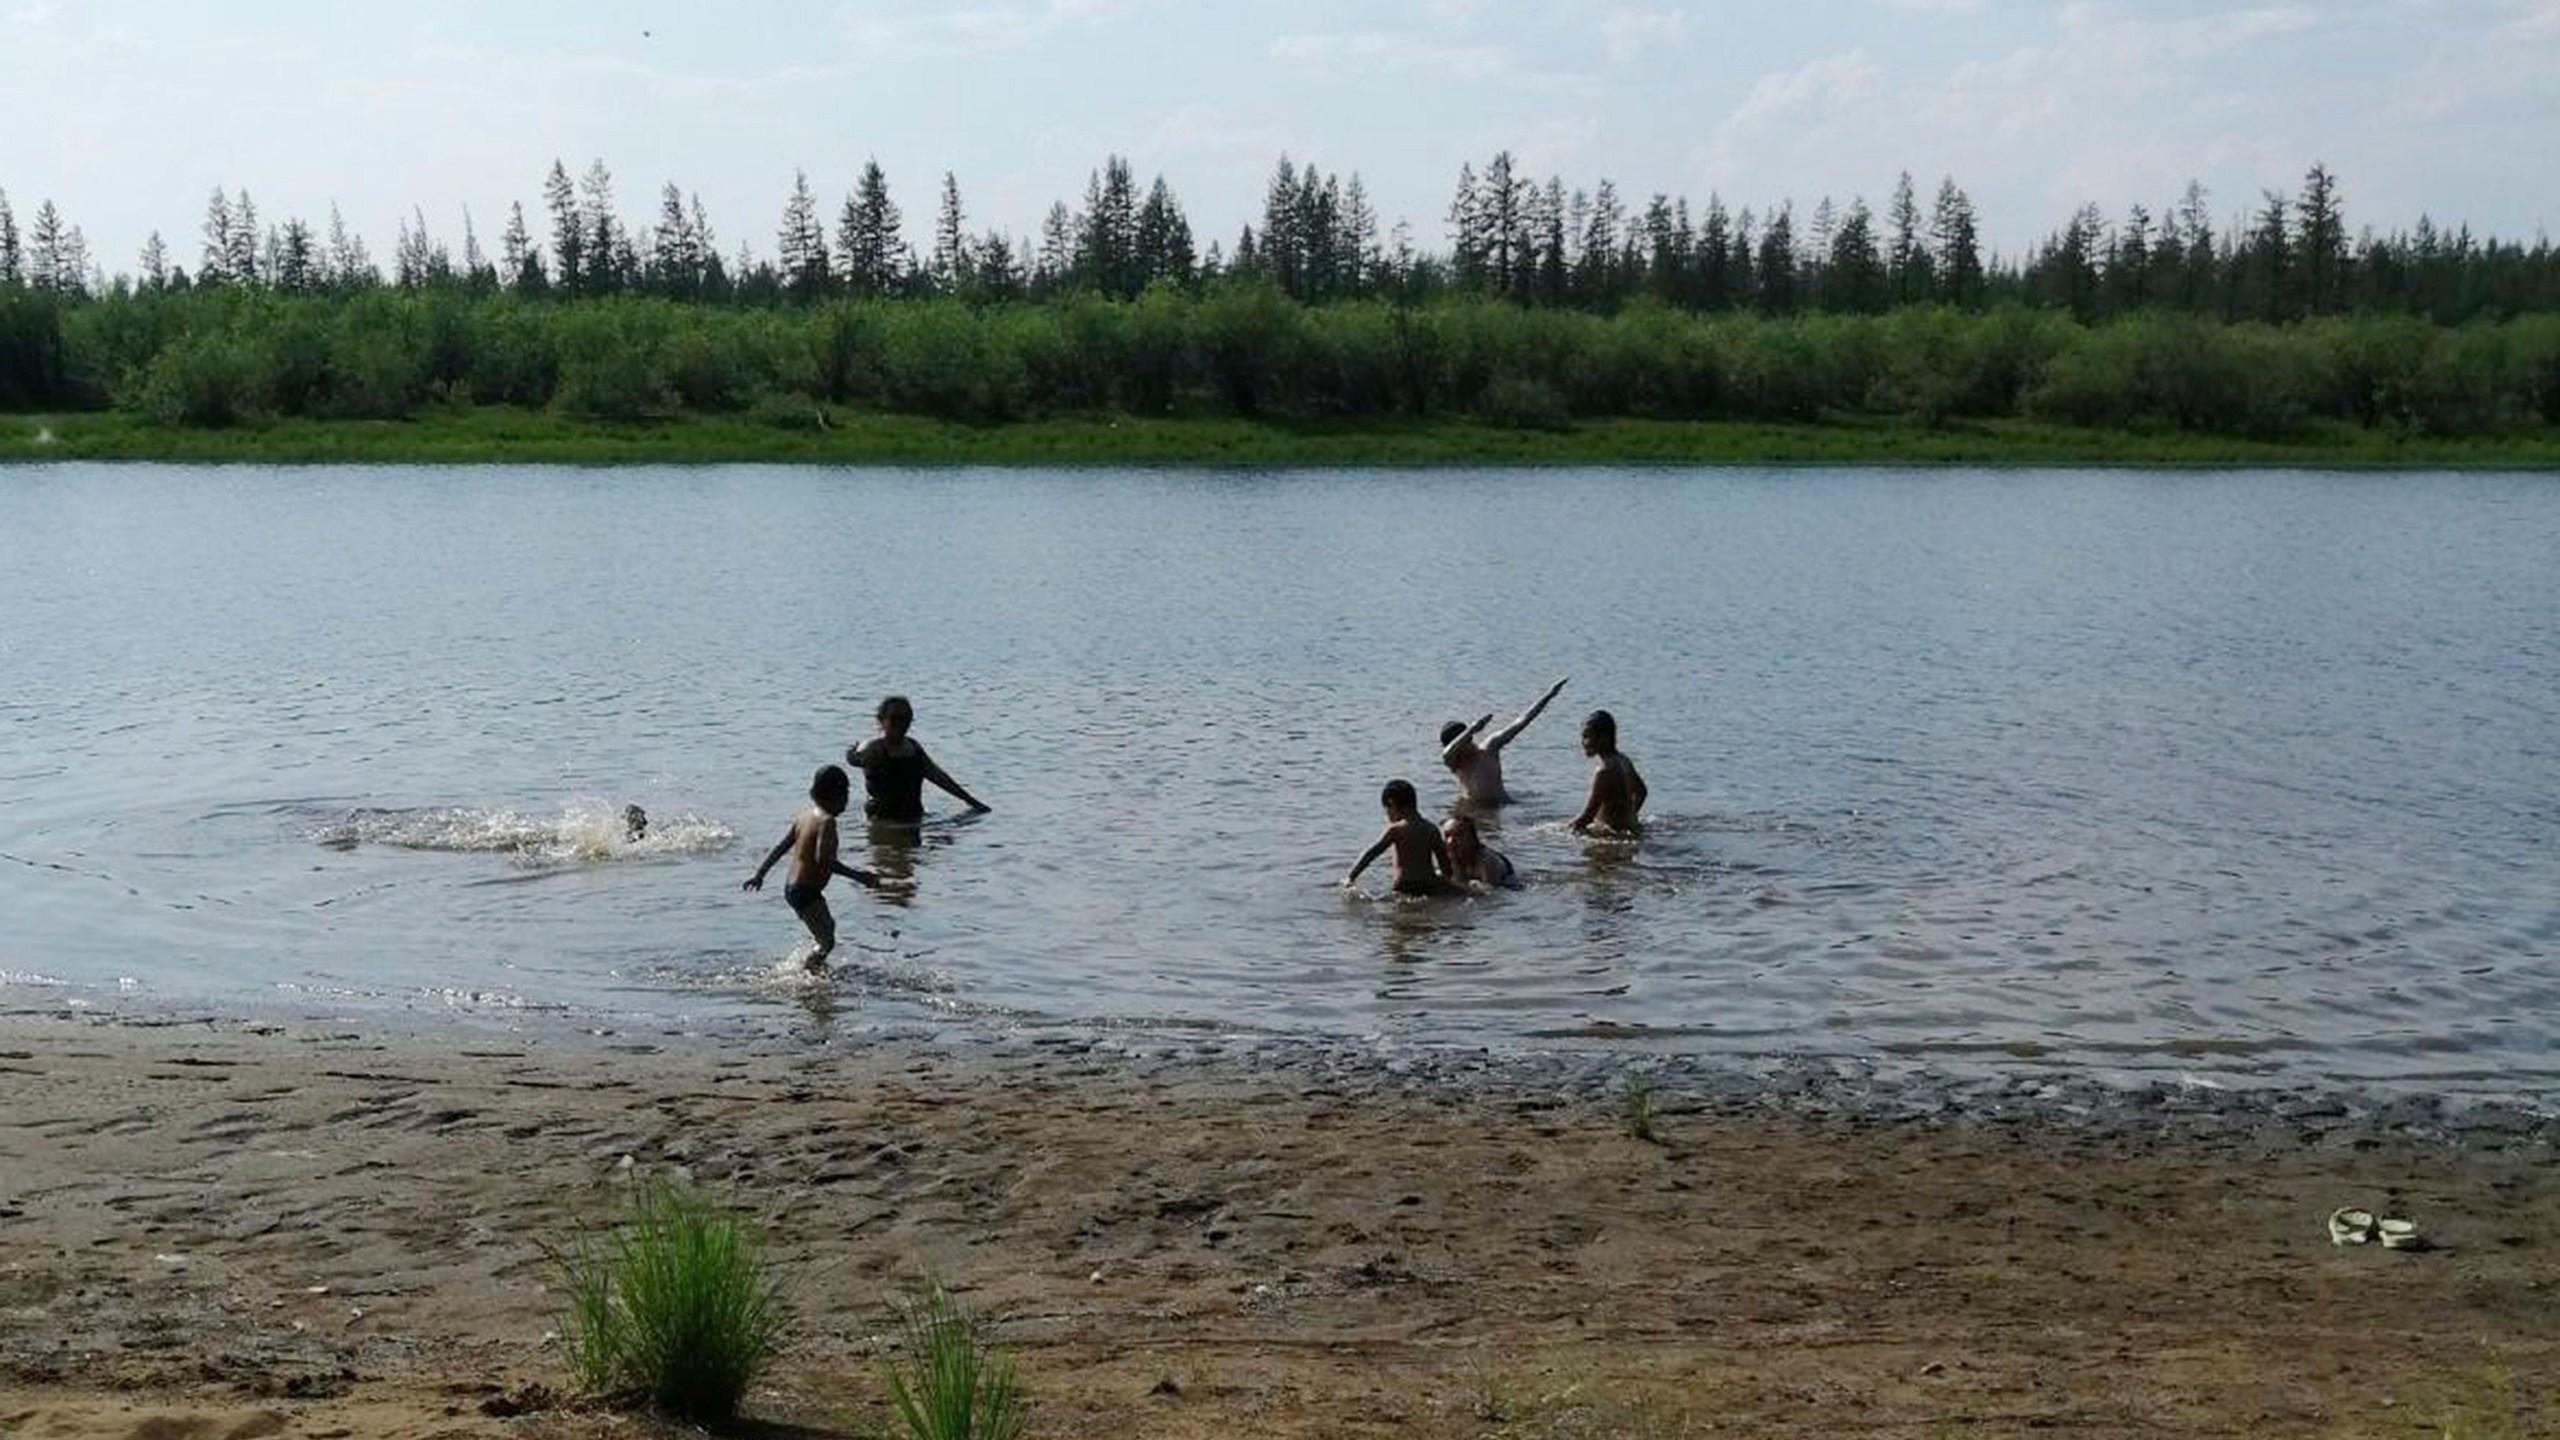 In this handout photo provided by Olga Burtseva, children play in the Krugloe lake outside Verkhoyansk, the Sakha Republic, about 4660 kilometers (2900 miles) northeast of Moscow, Russia, Sunday, June 21, 2020. (Olga Burtseva via AP)